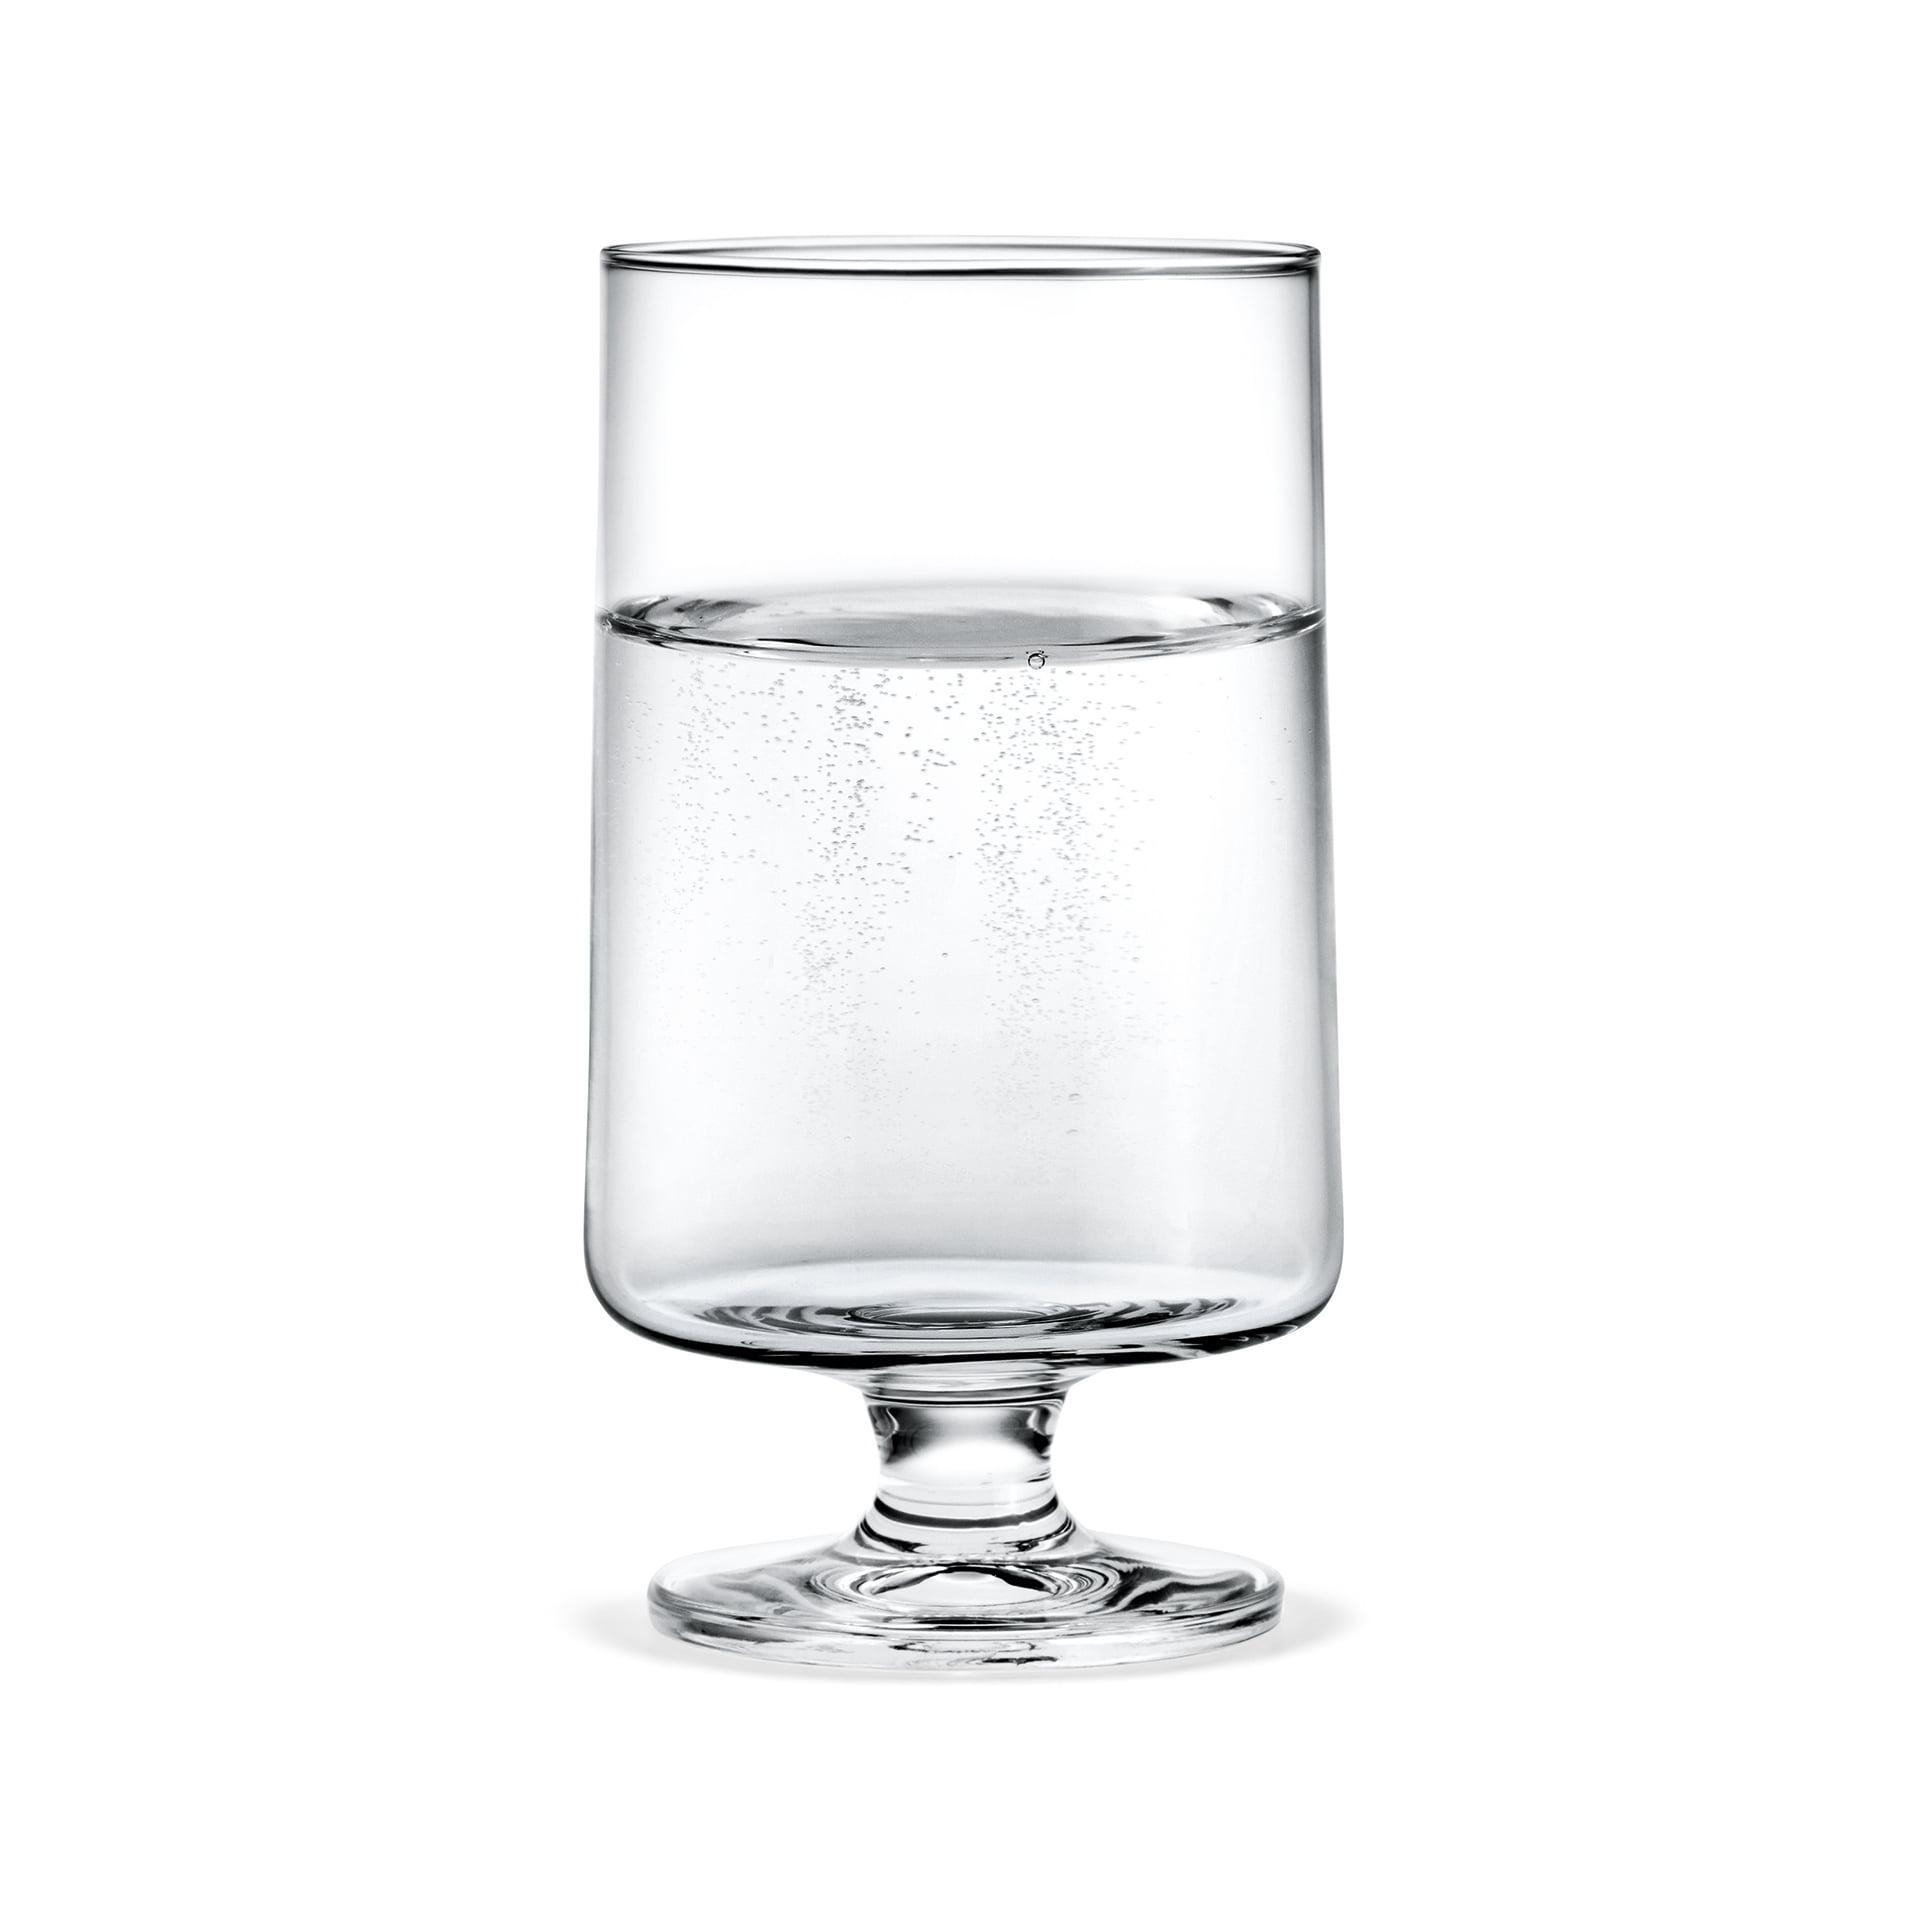 Stub glas stort